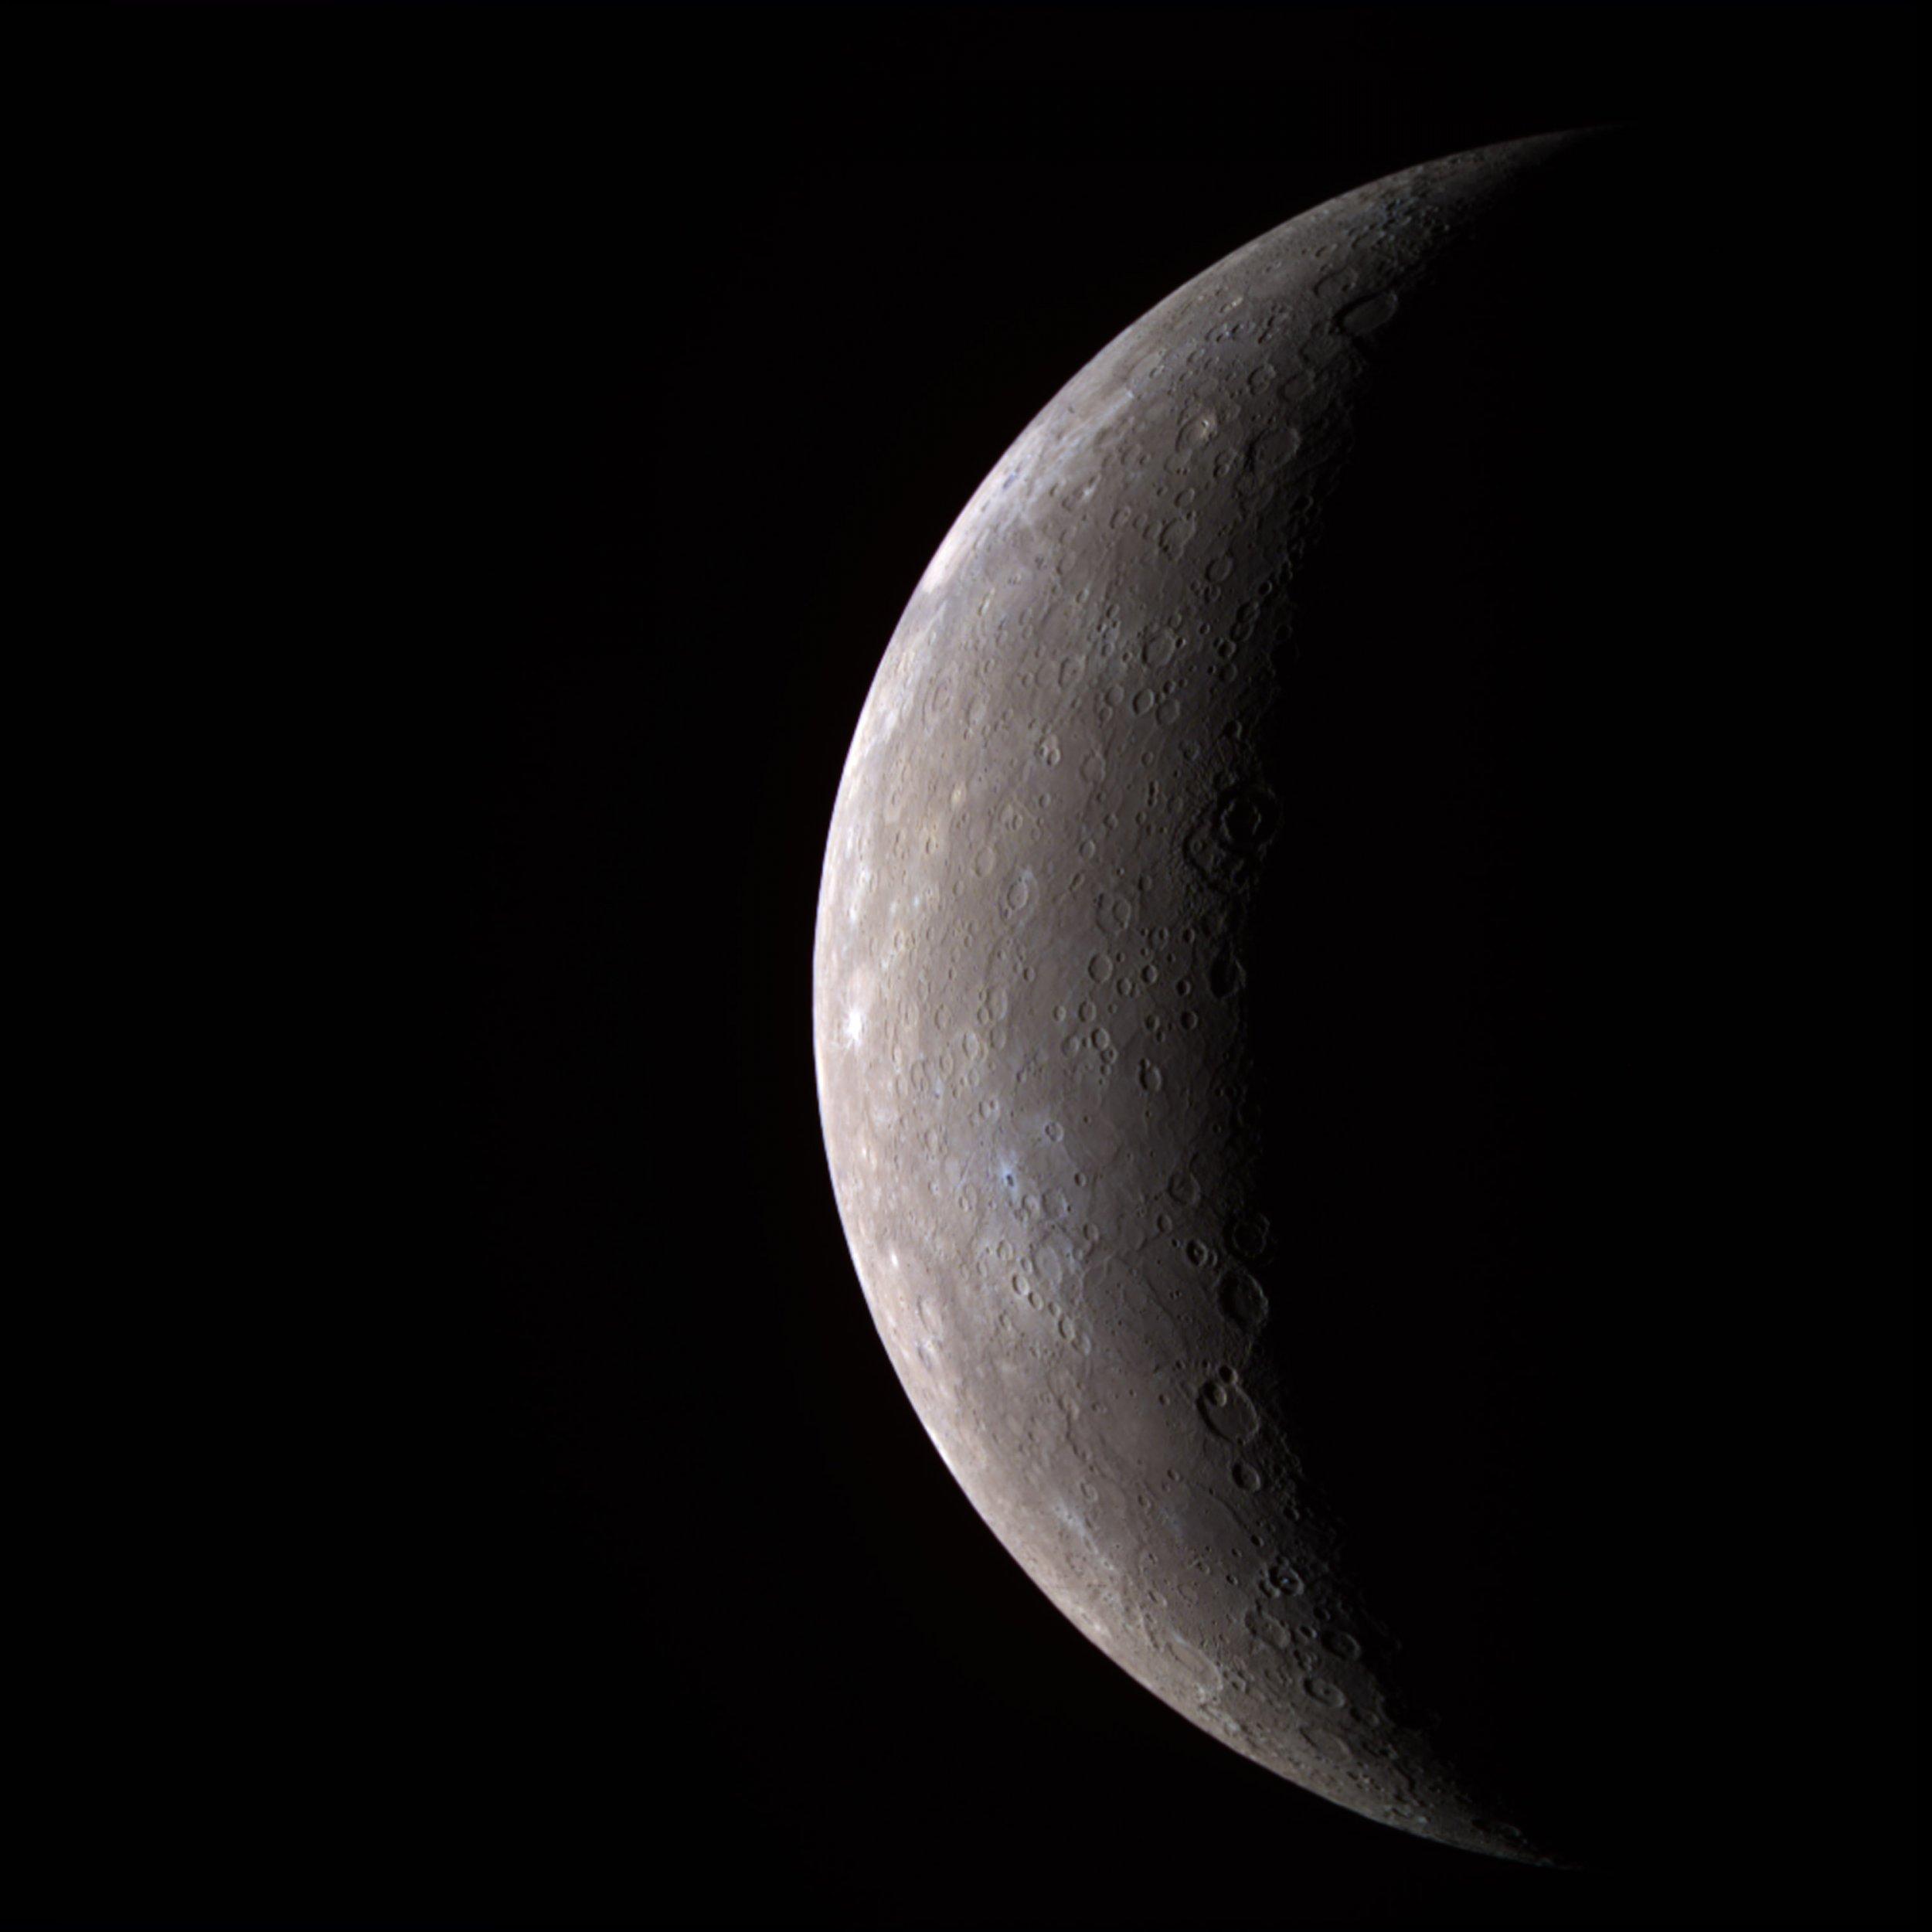 Mercury Messenger 2008